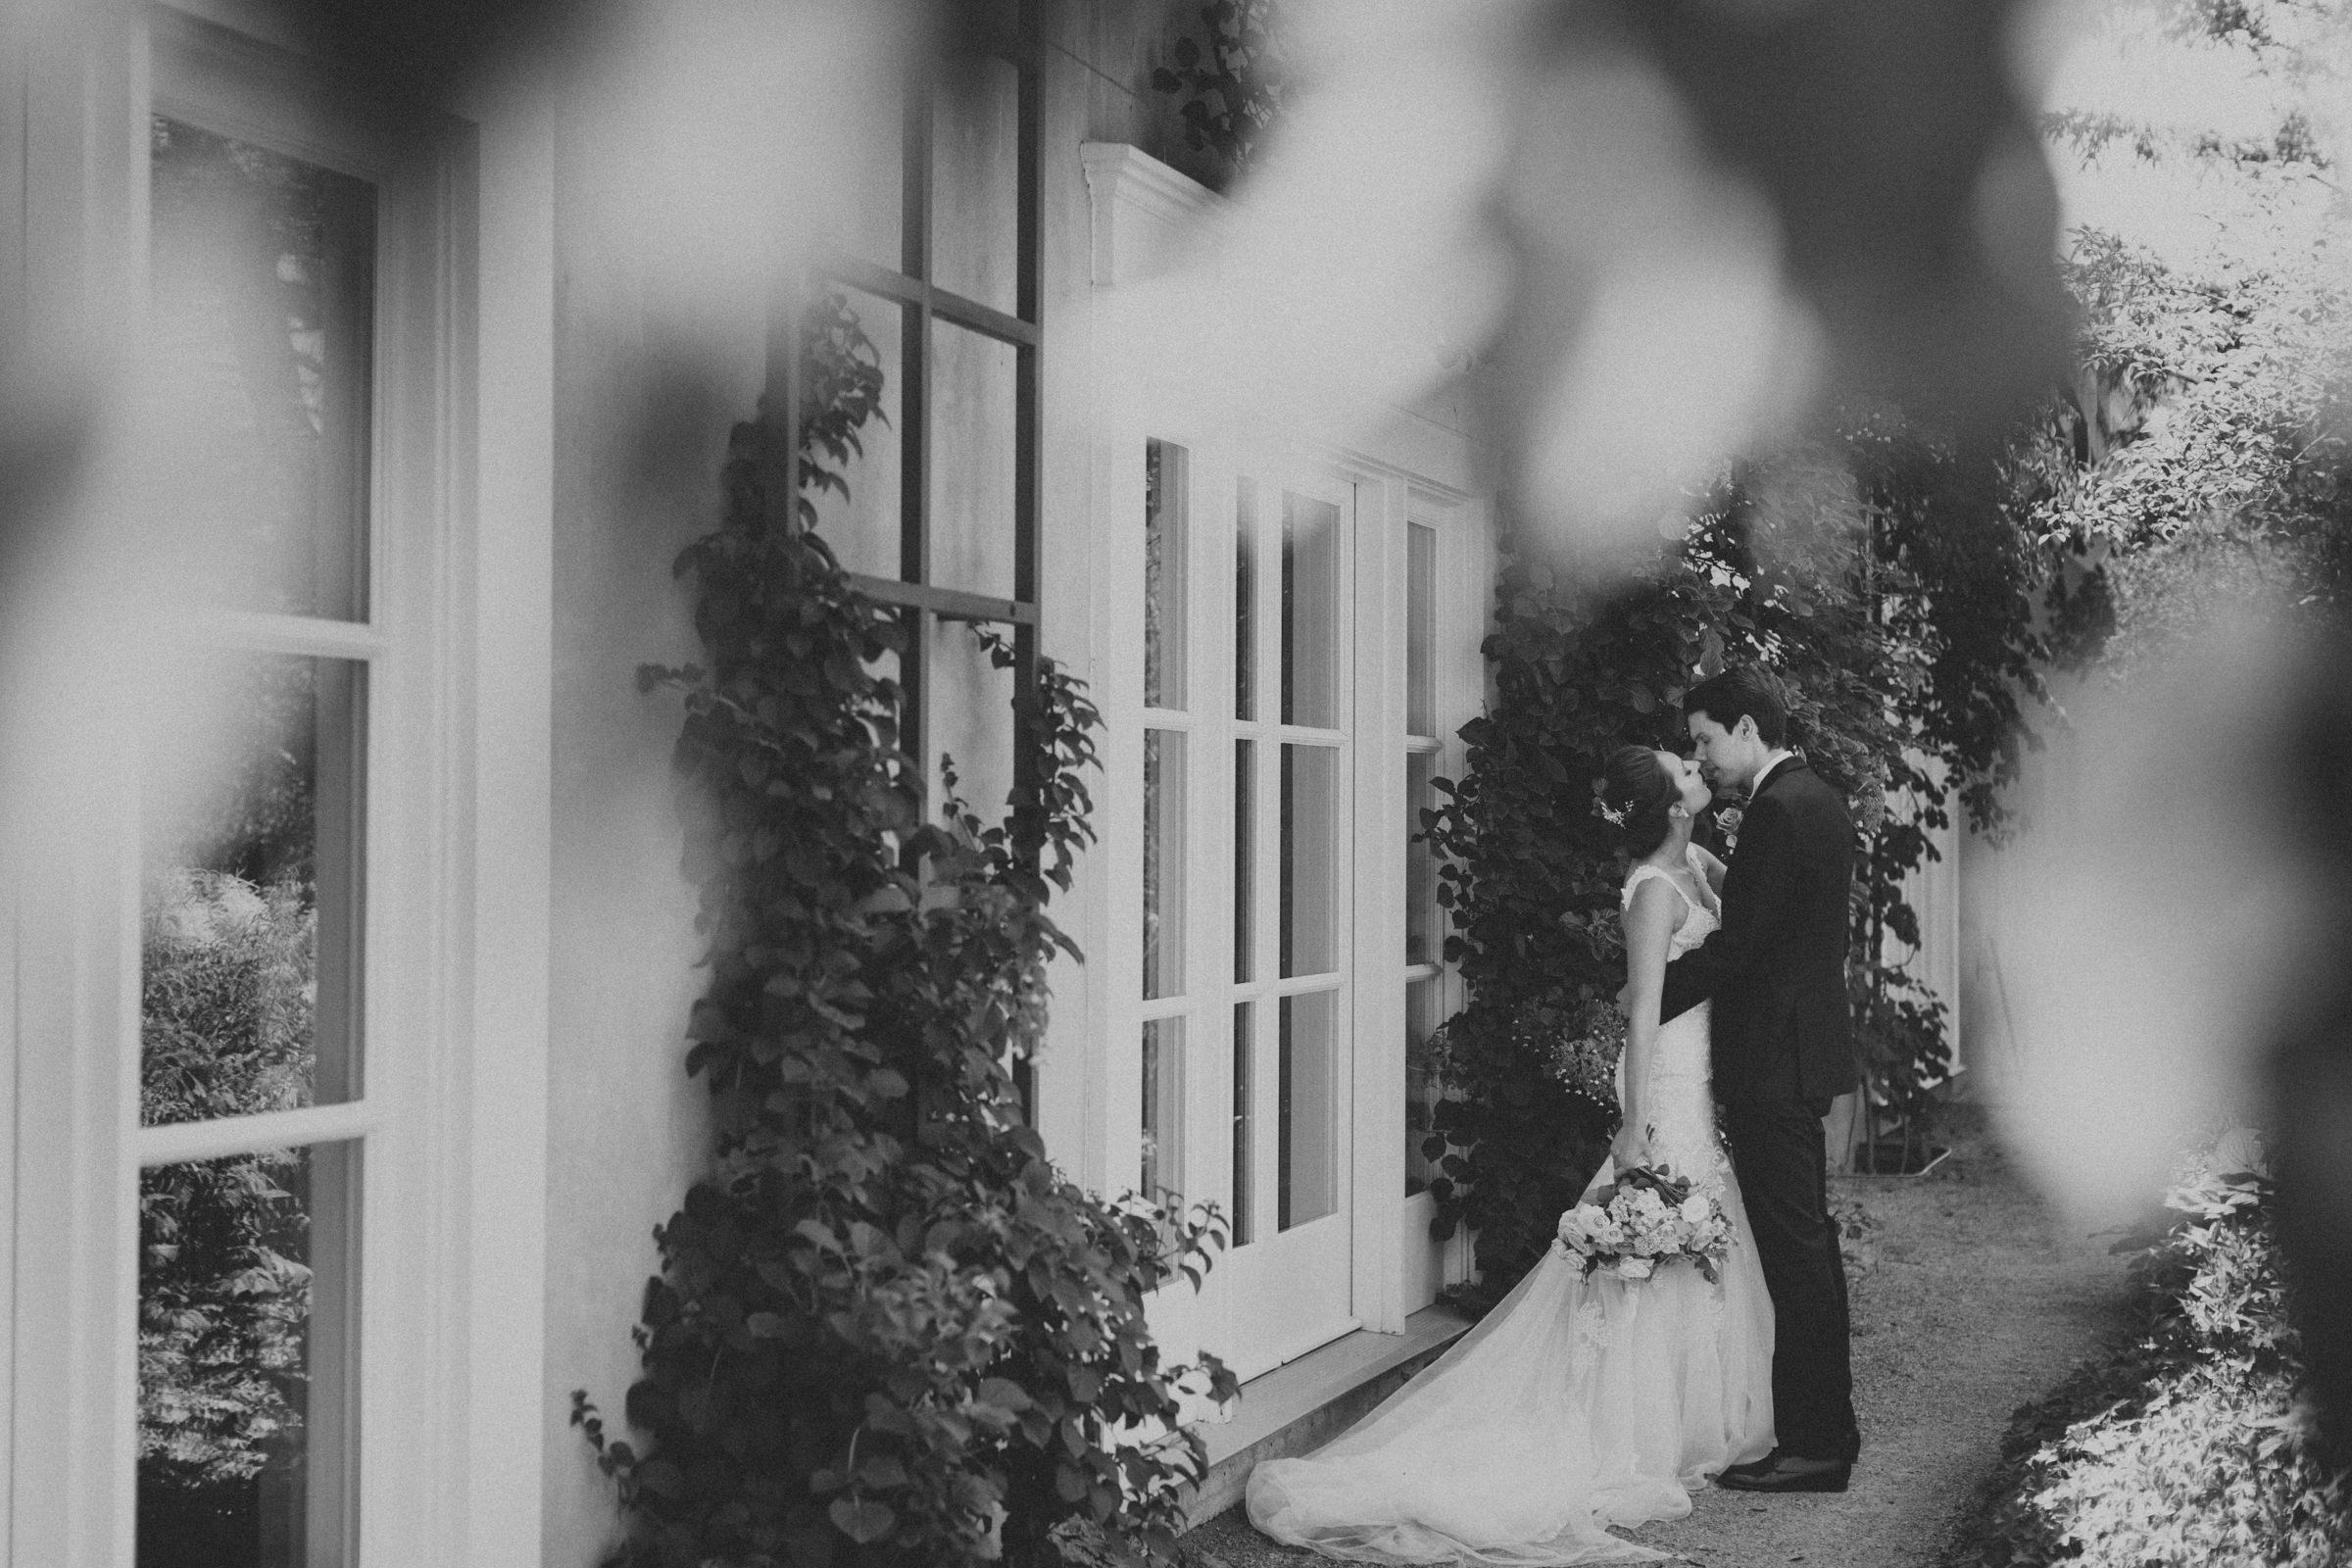 Langdon-Hall-wedding-photography-Cambridge-by-Sam-Wong-of-Visual-Cravings_Sarah-Ryan_22.jpg